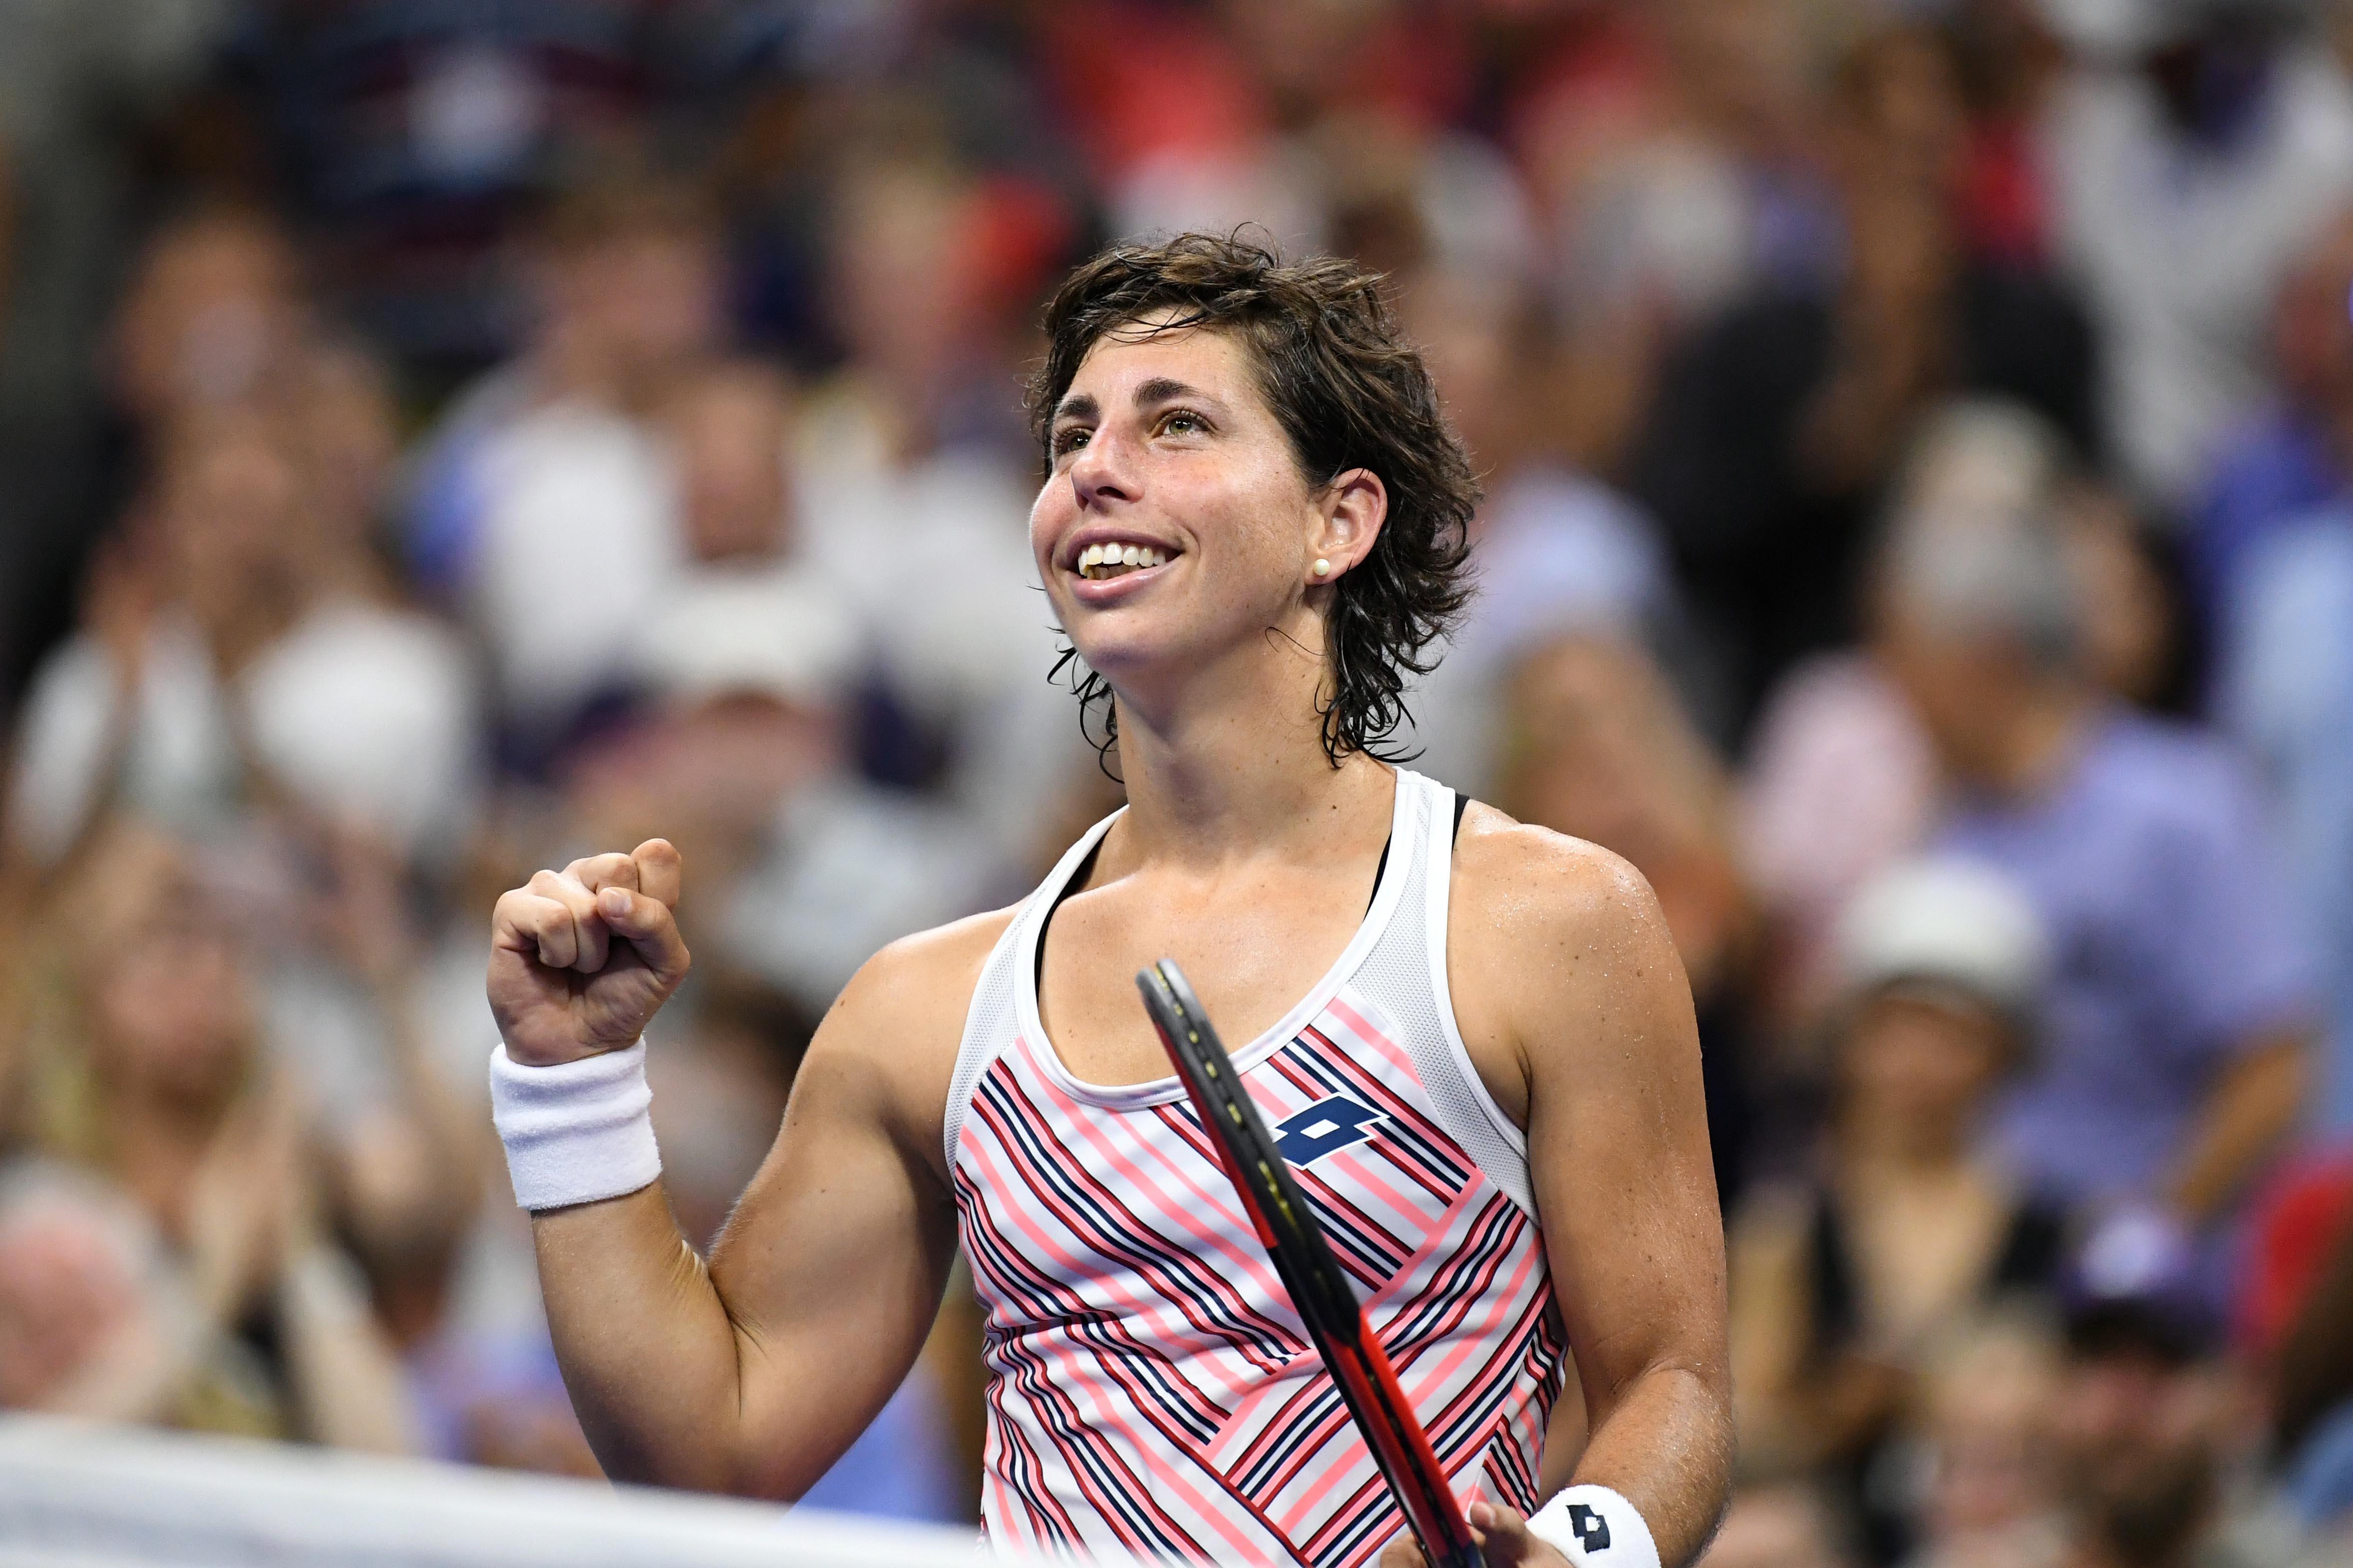 Tennis: Suarez Navarro sends Sharapova crashing out of US Open